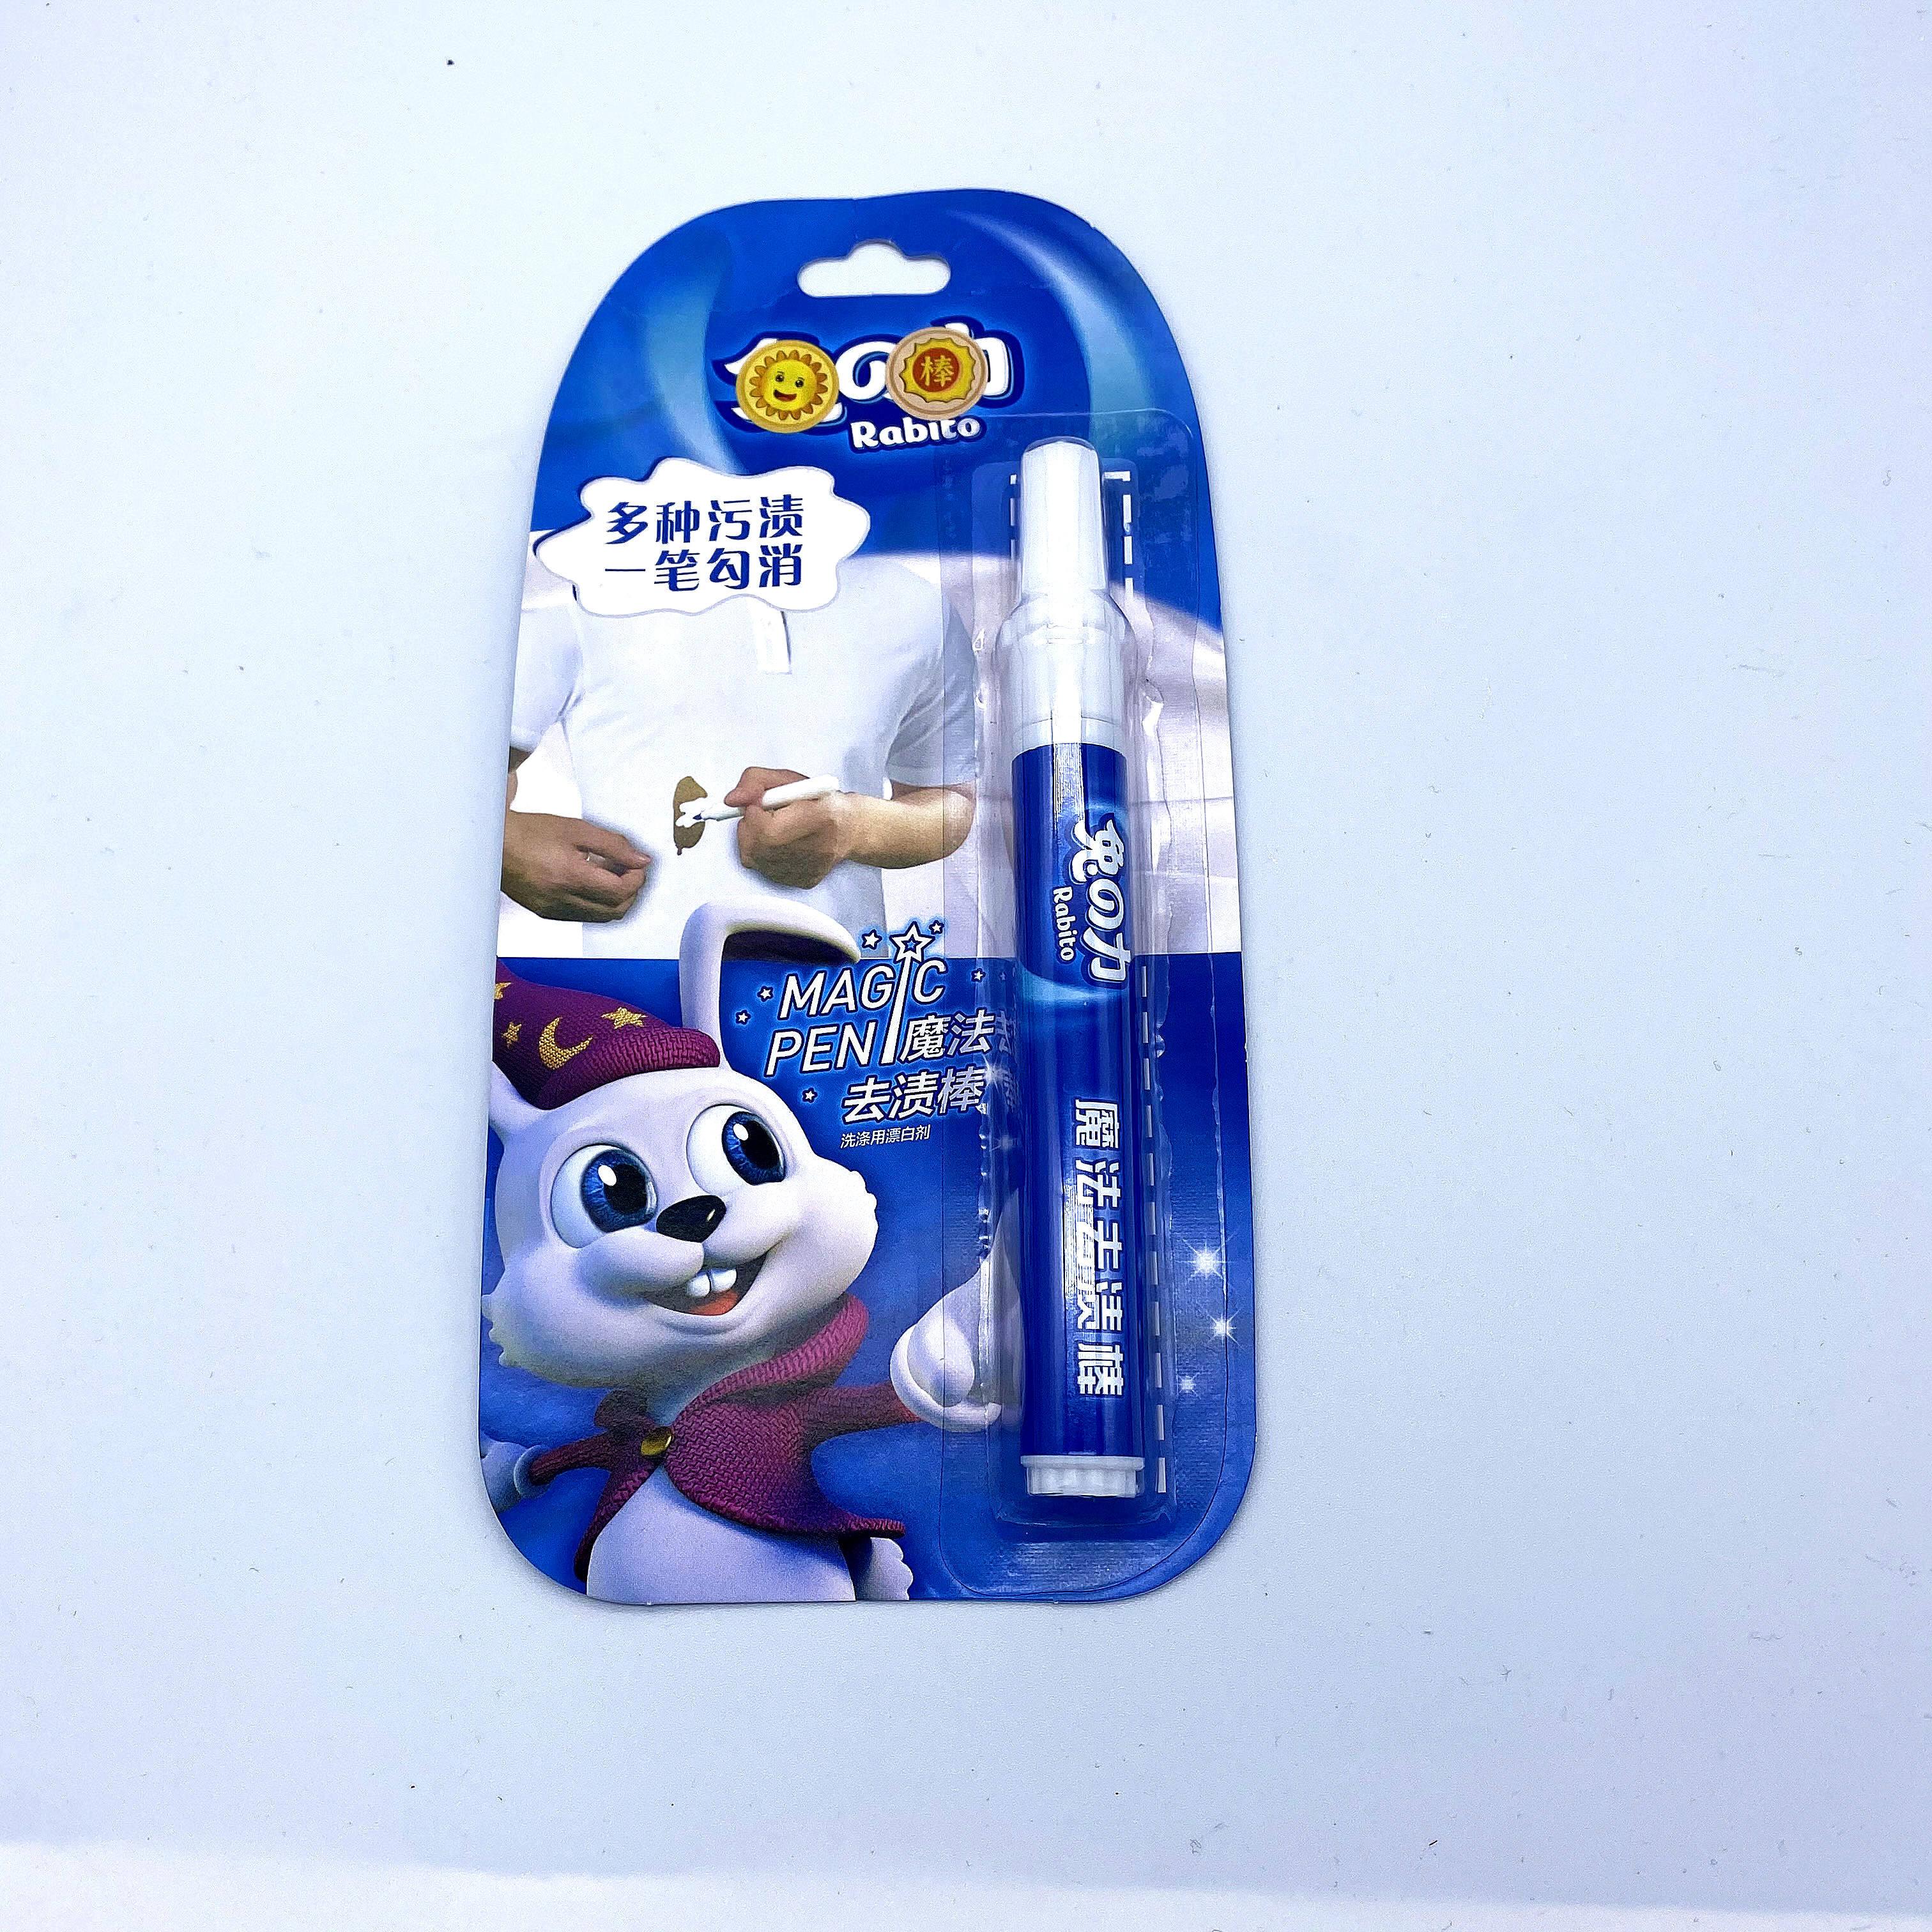 10ml Caneta Lixívia, melhor produto de limpeza para o pano branco, fácil de levar